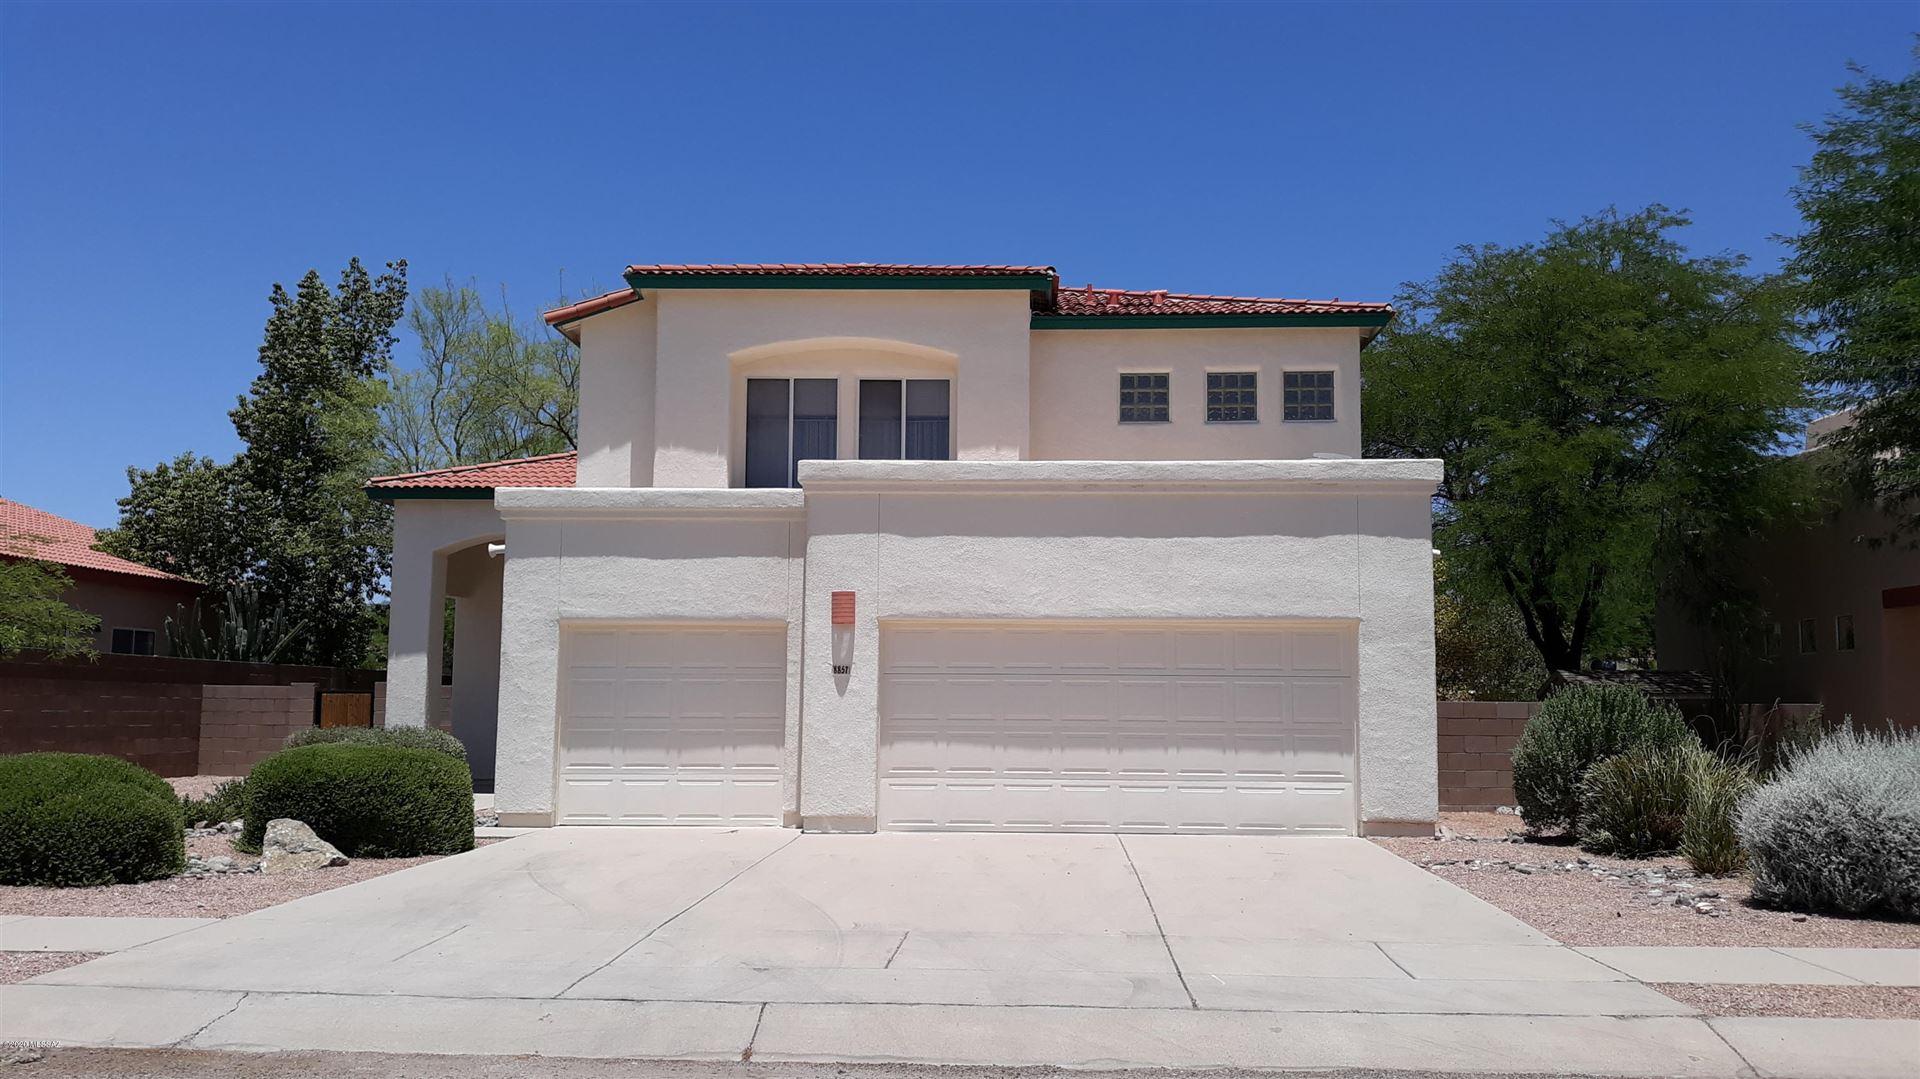 8857 E Penstemon Drive, Tucson, AZ 85715 - MLS#: 22016343